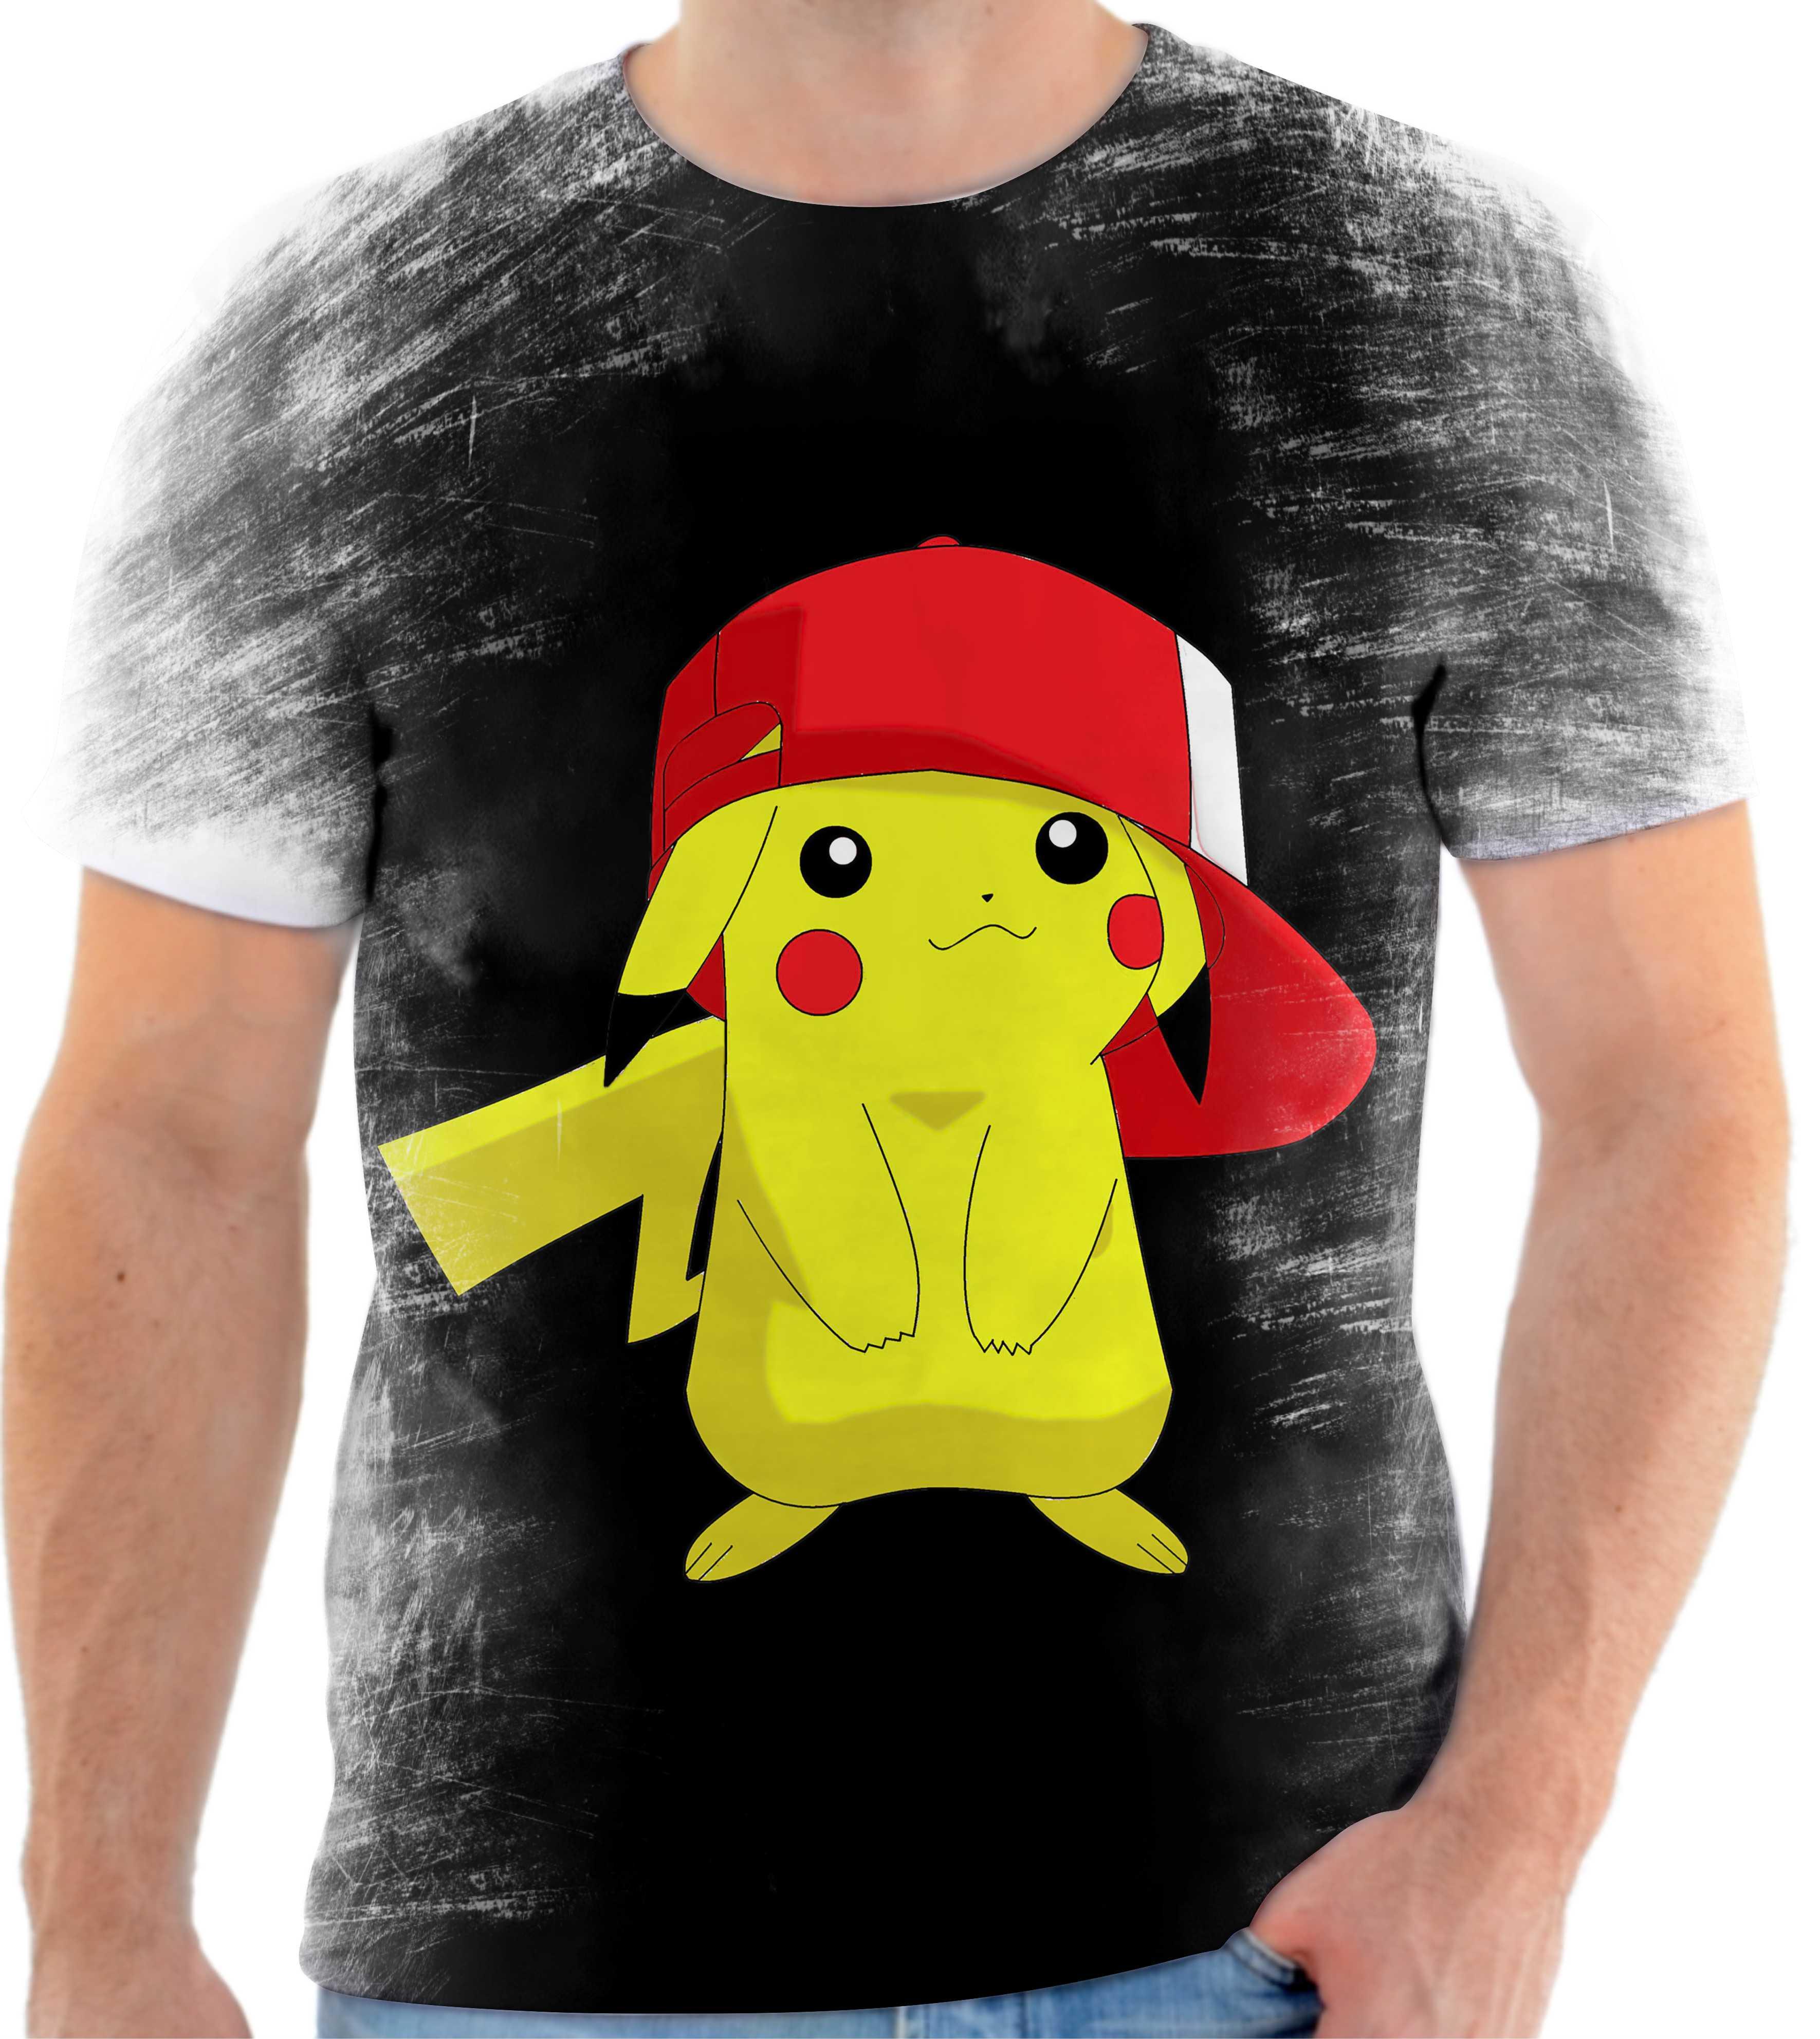 d0610625c Assistir Pokemon Online 2 Temporada